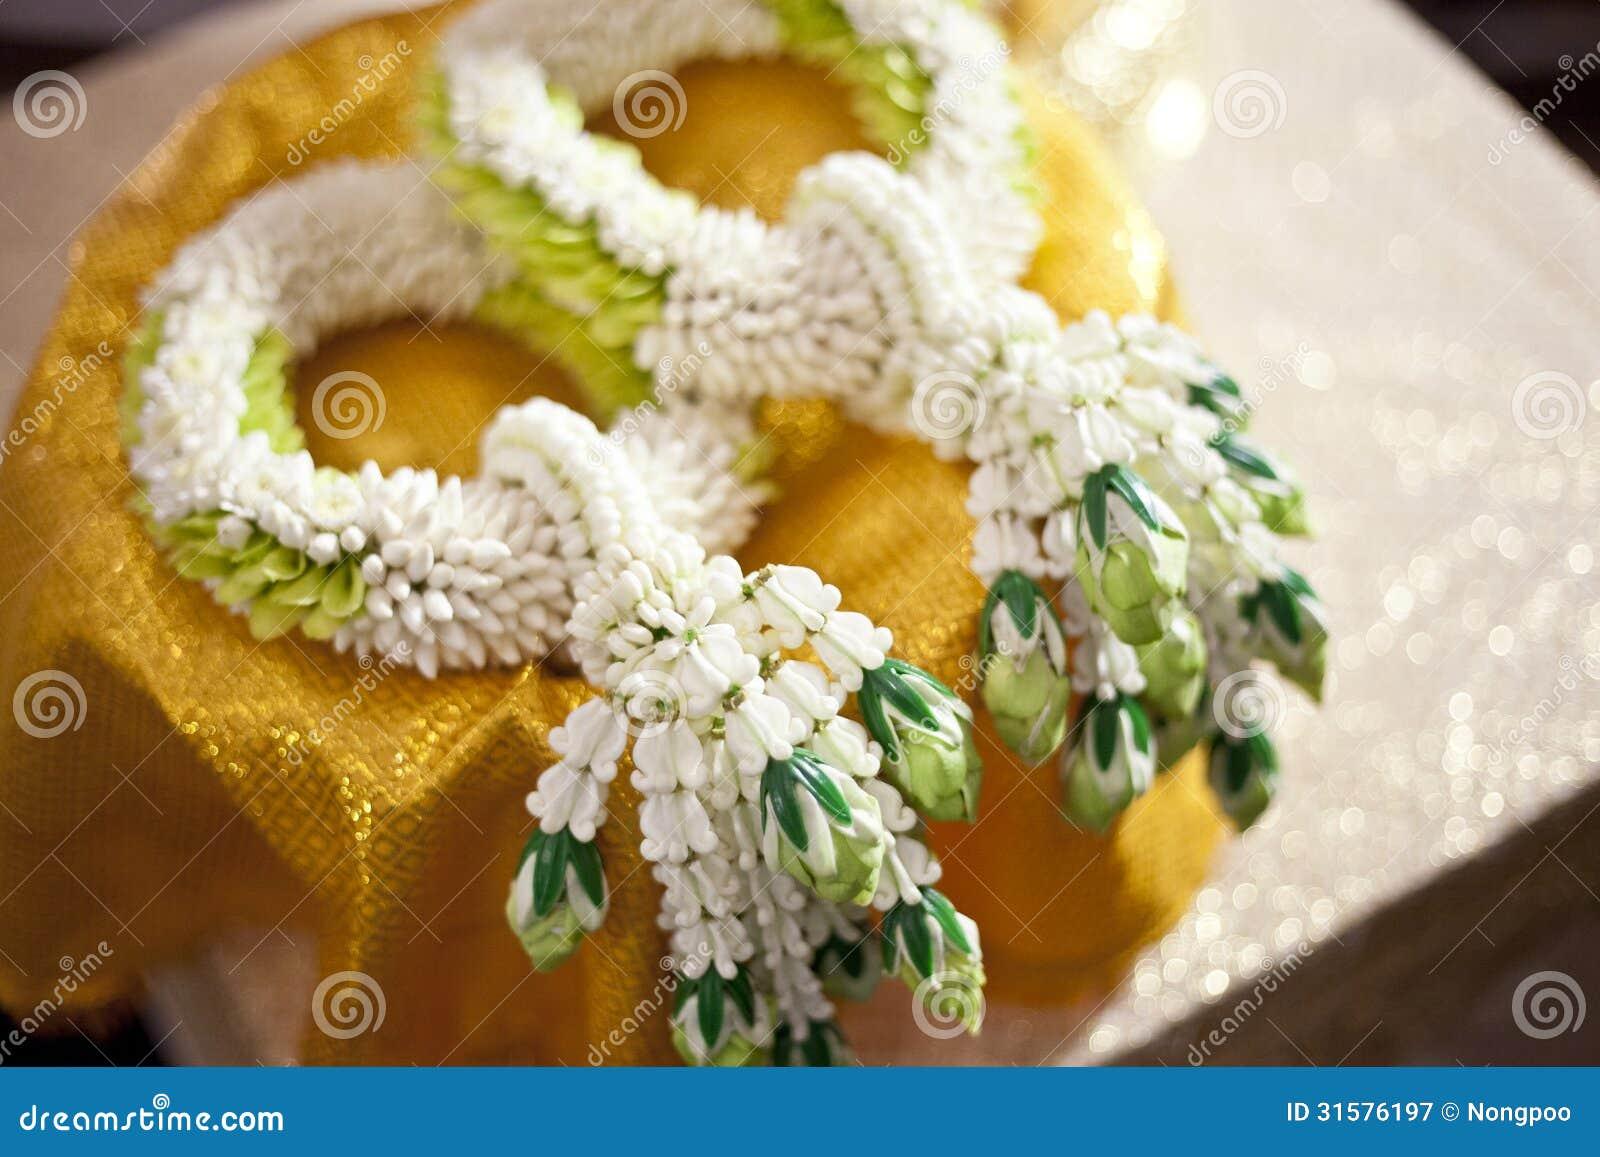 Thai Jasmin Wedding Garland For Groom And Bride, Thailand Weddin